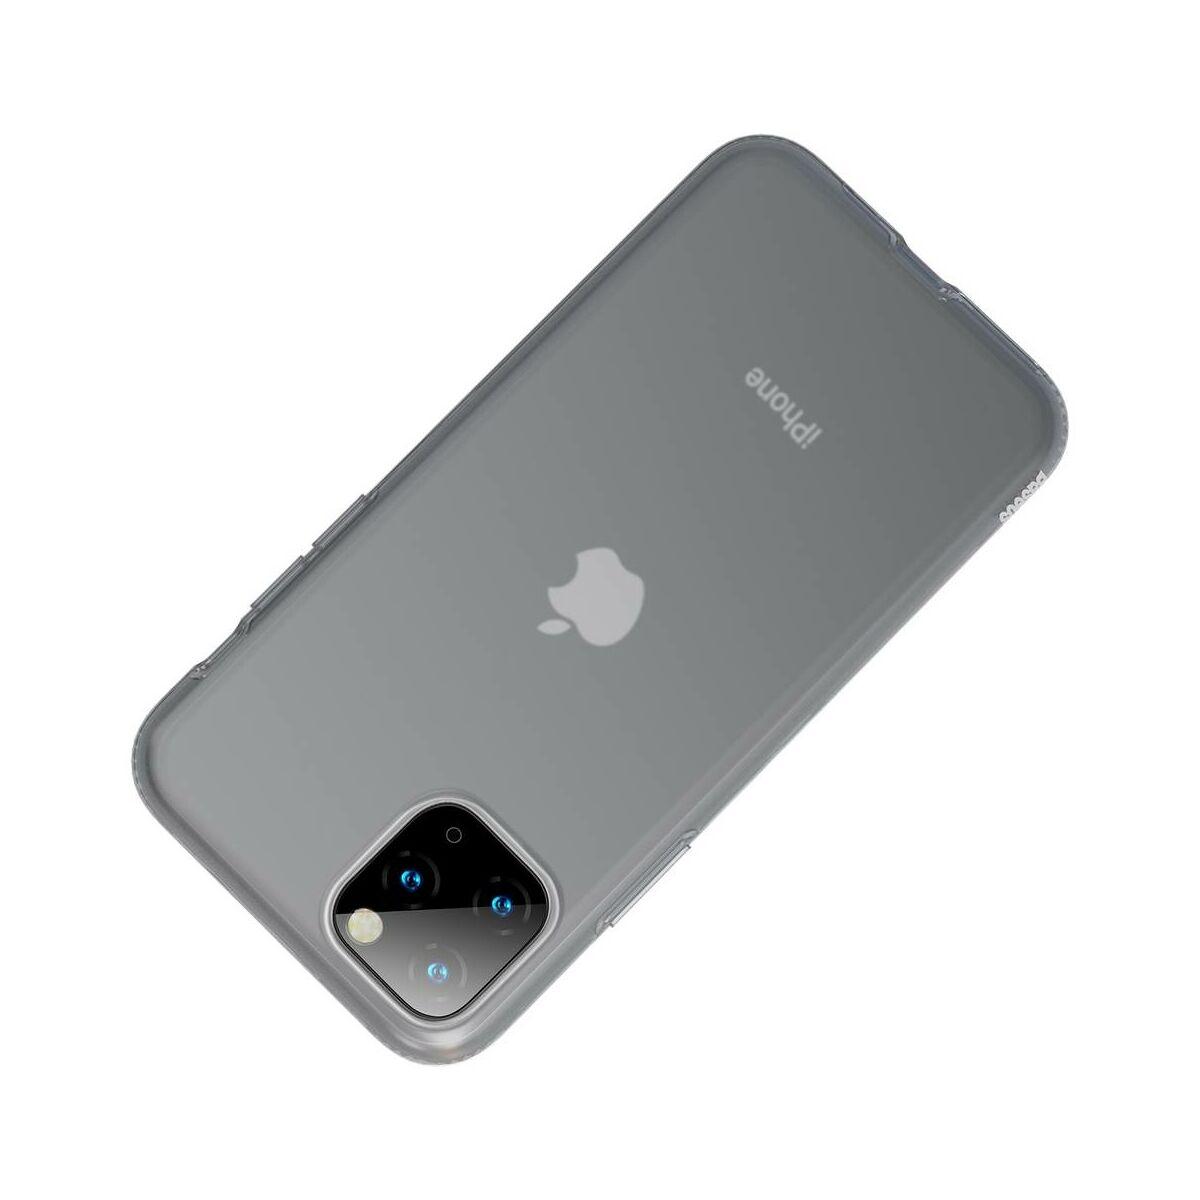 Baseus iPhone 11 Pro Max tok, Jelly Liquid Silica Gel Protective, átlátszó fekete (WIAPIPH65S-GD01)